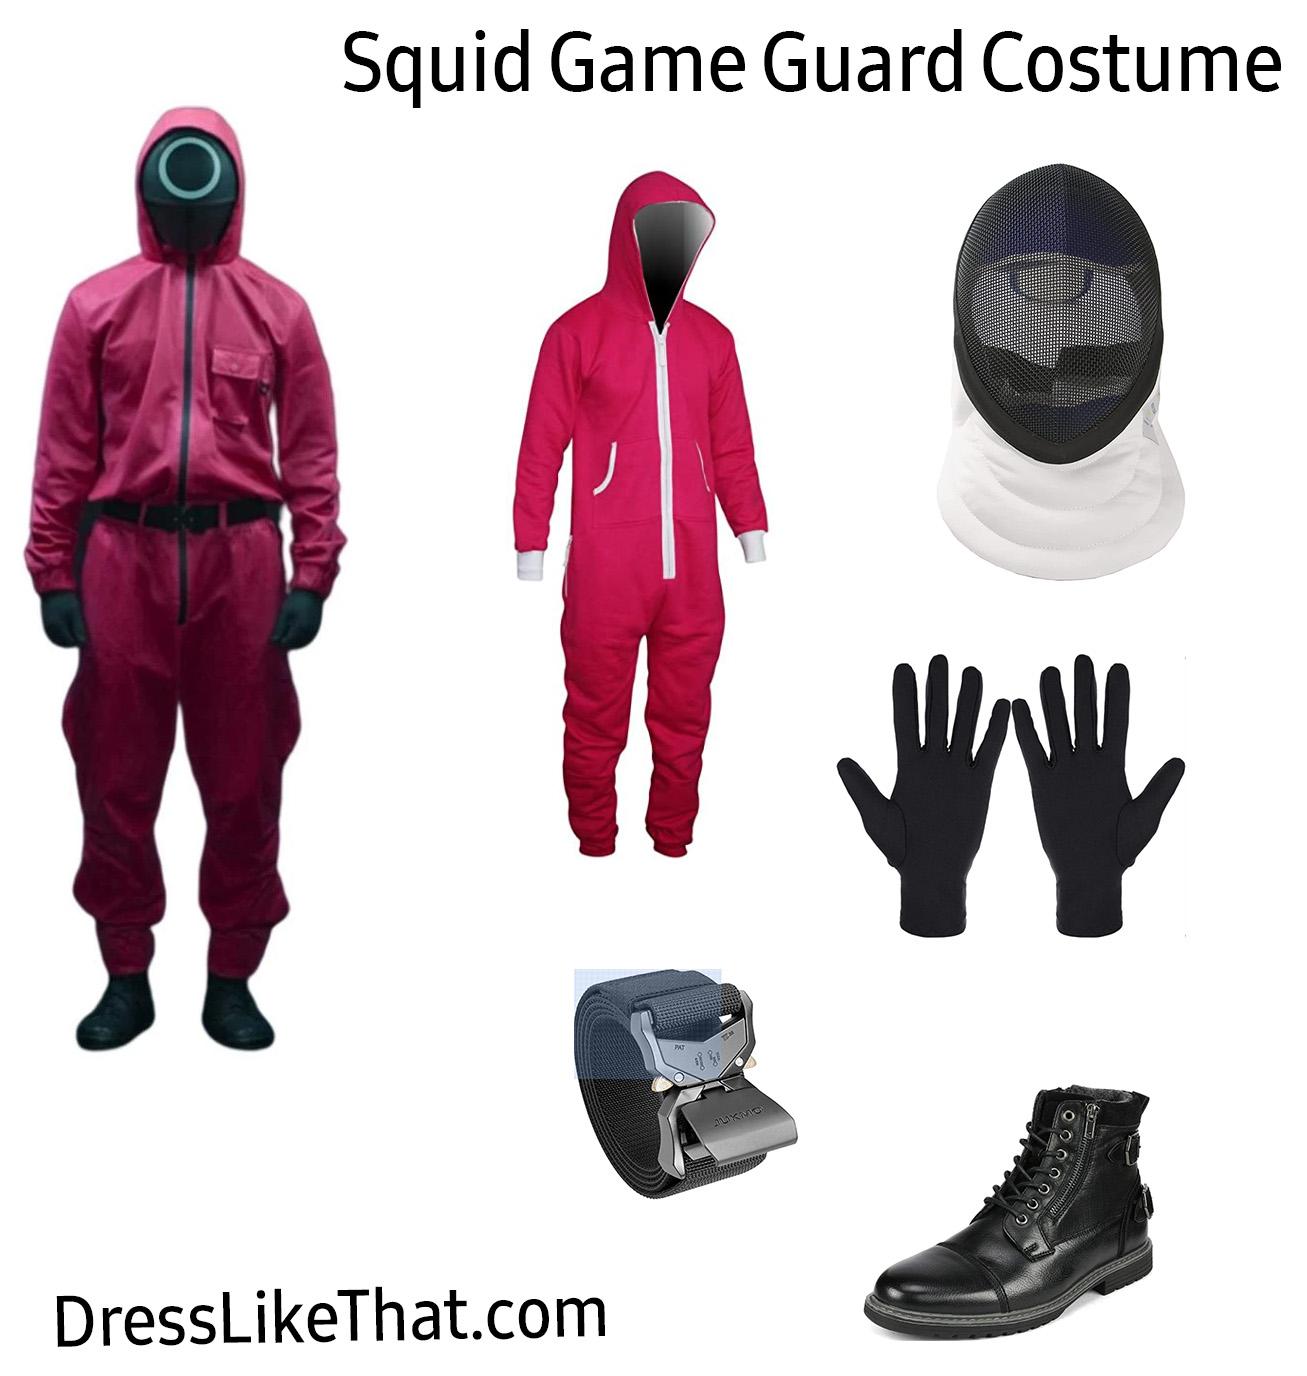 squid game - guard costume items